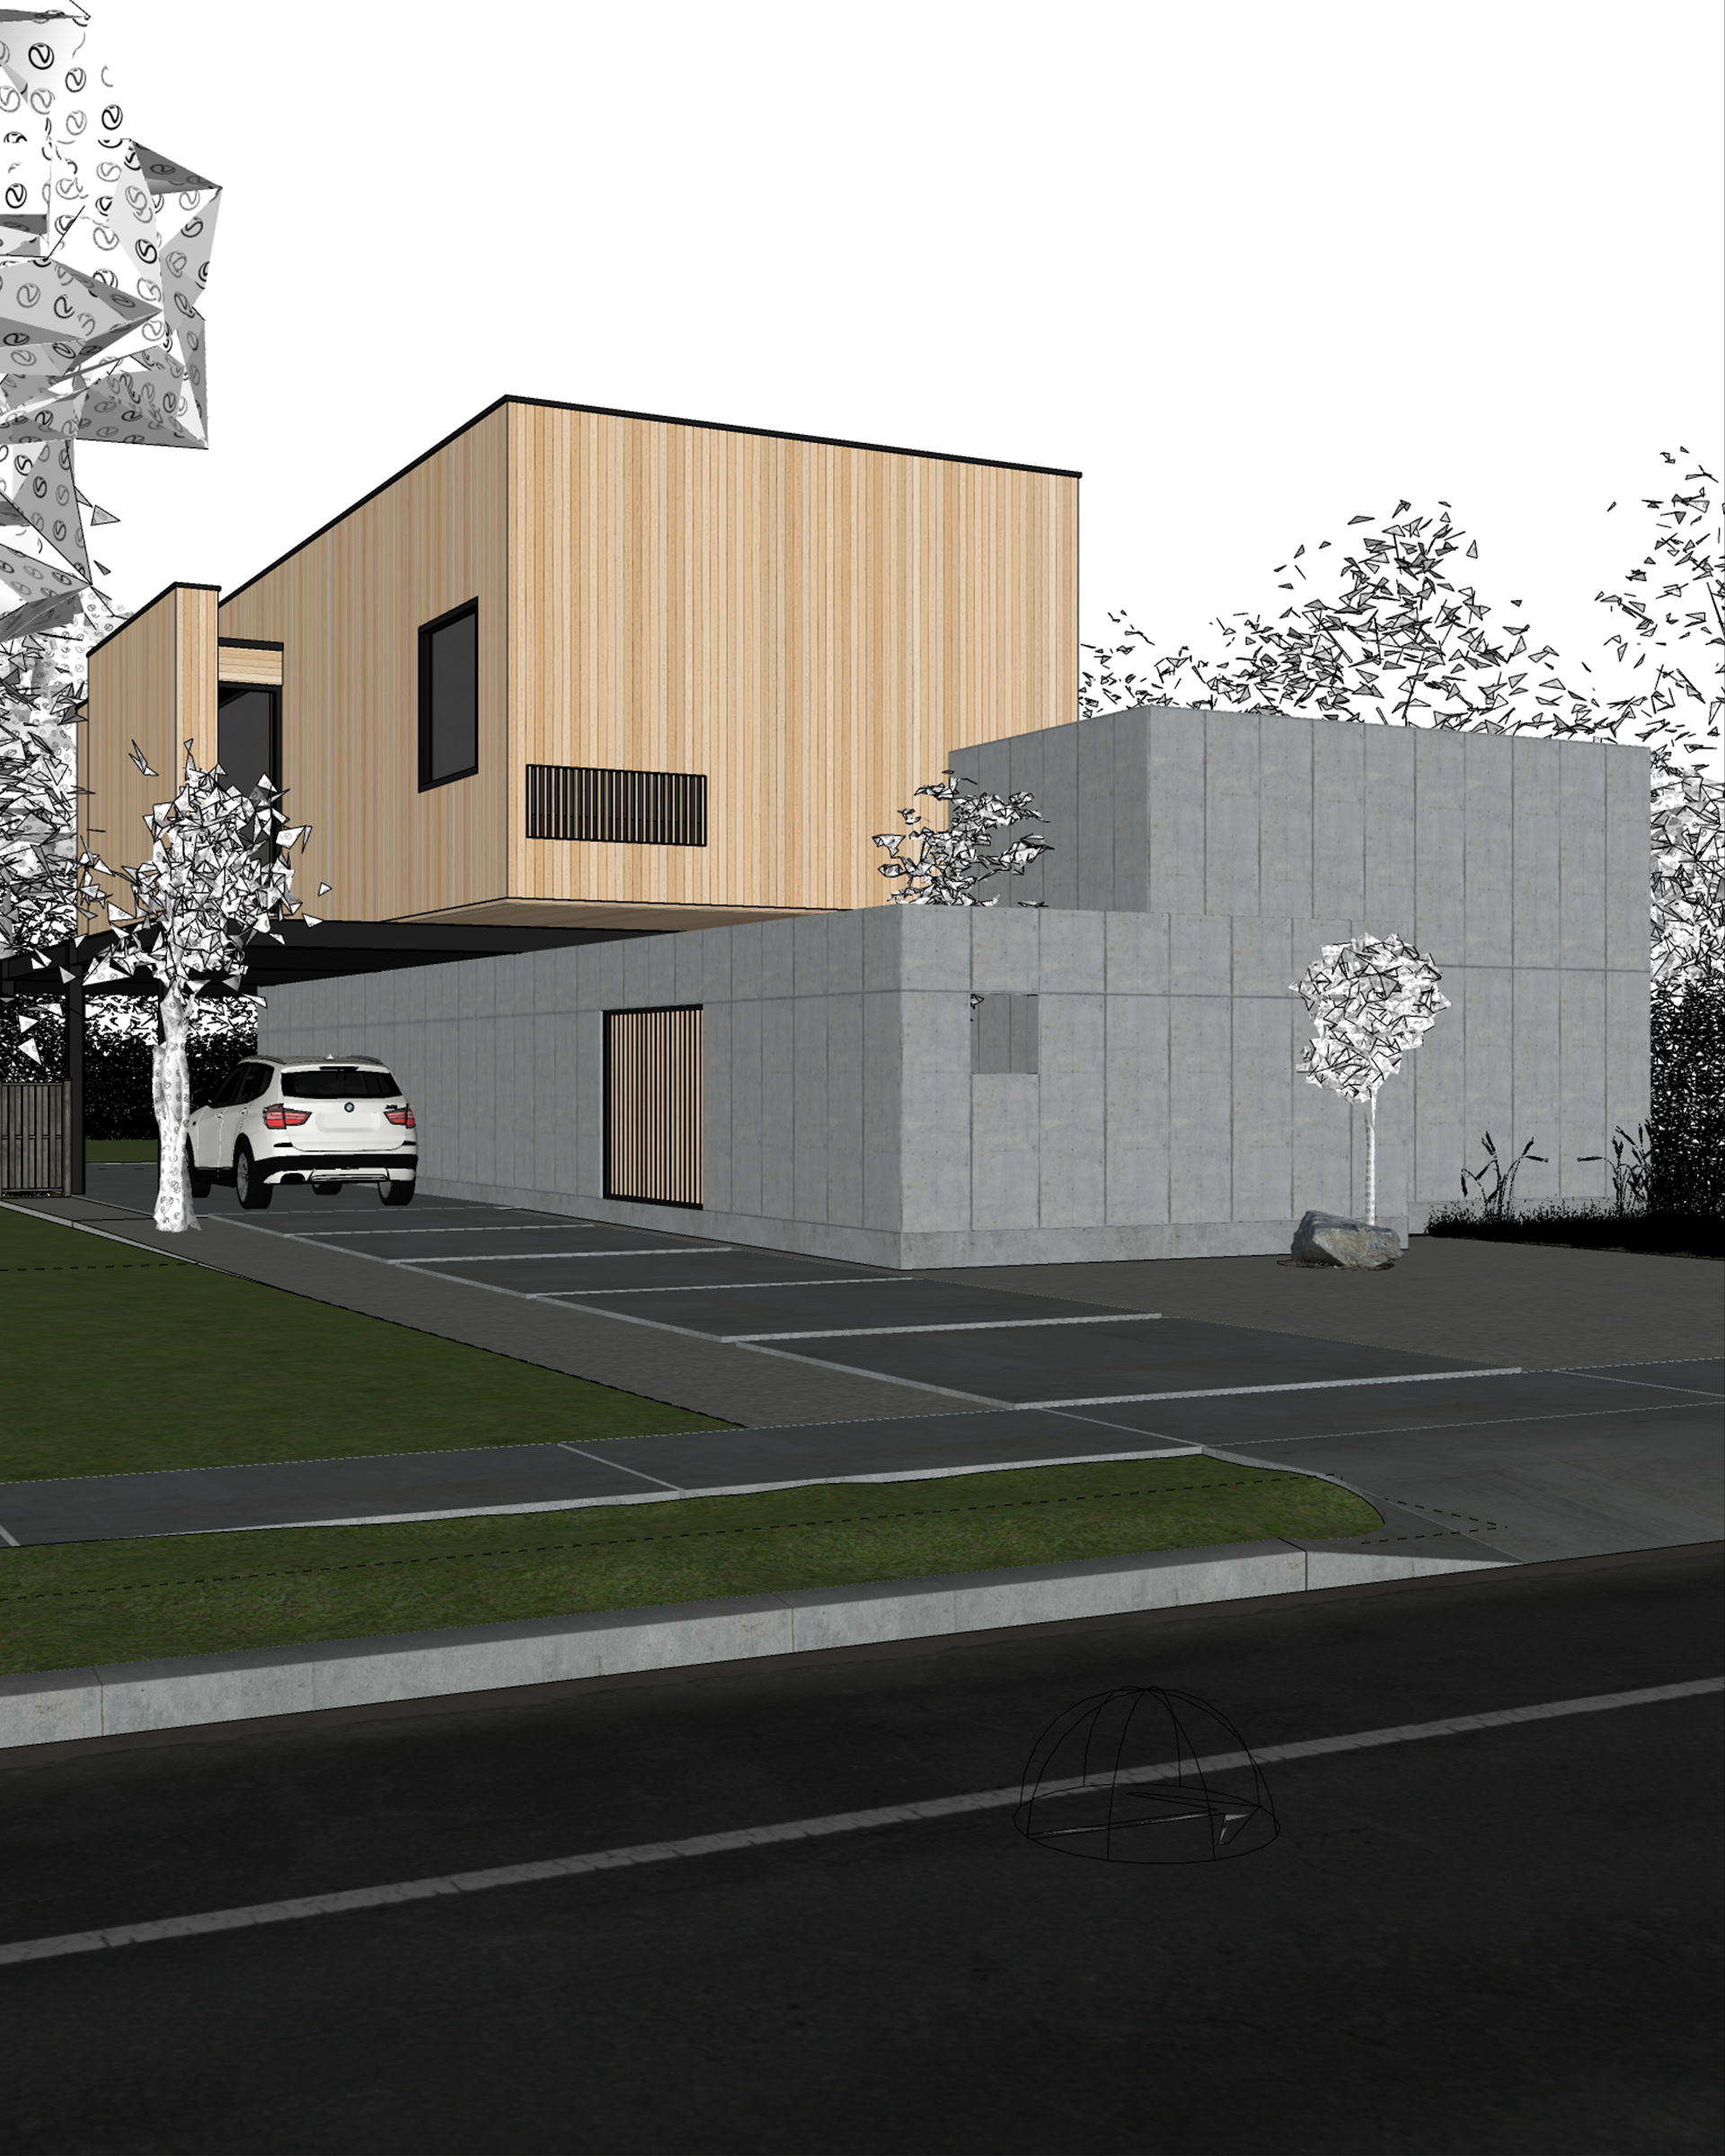 Concrete Box House View 1 Screenshot.jpg